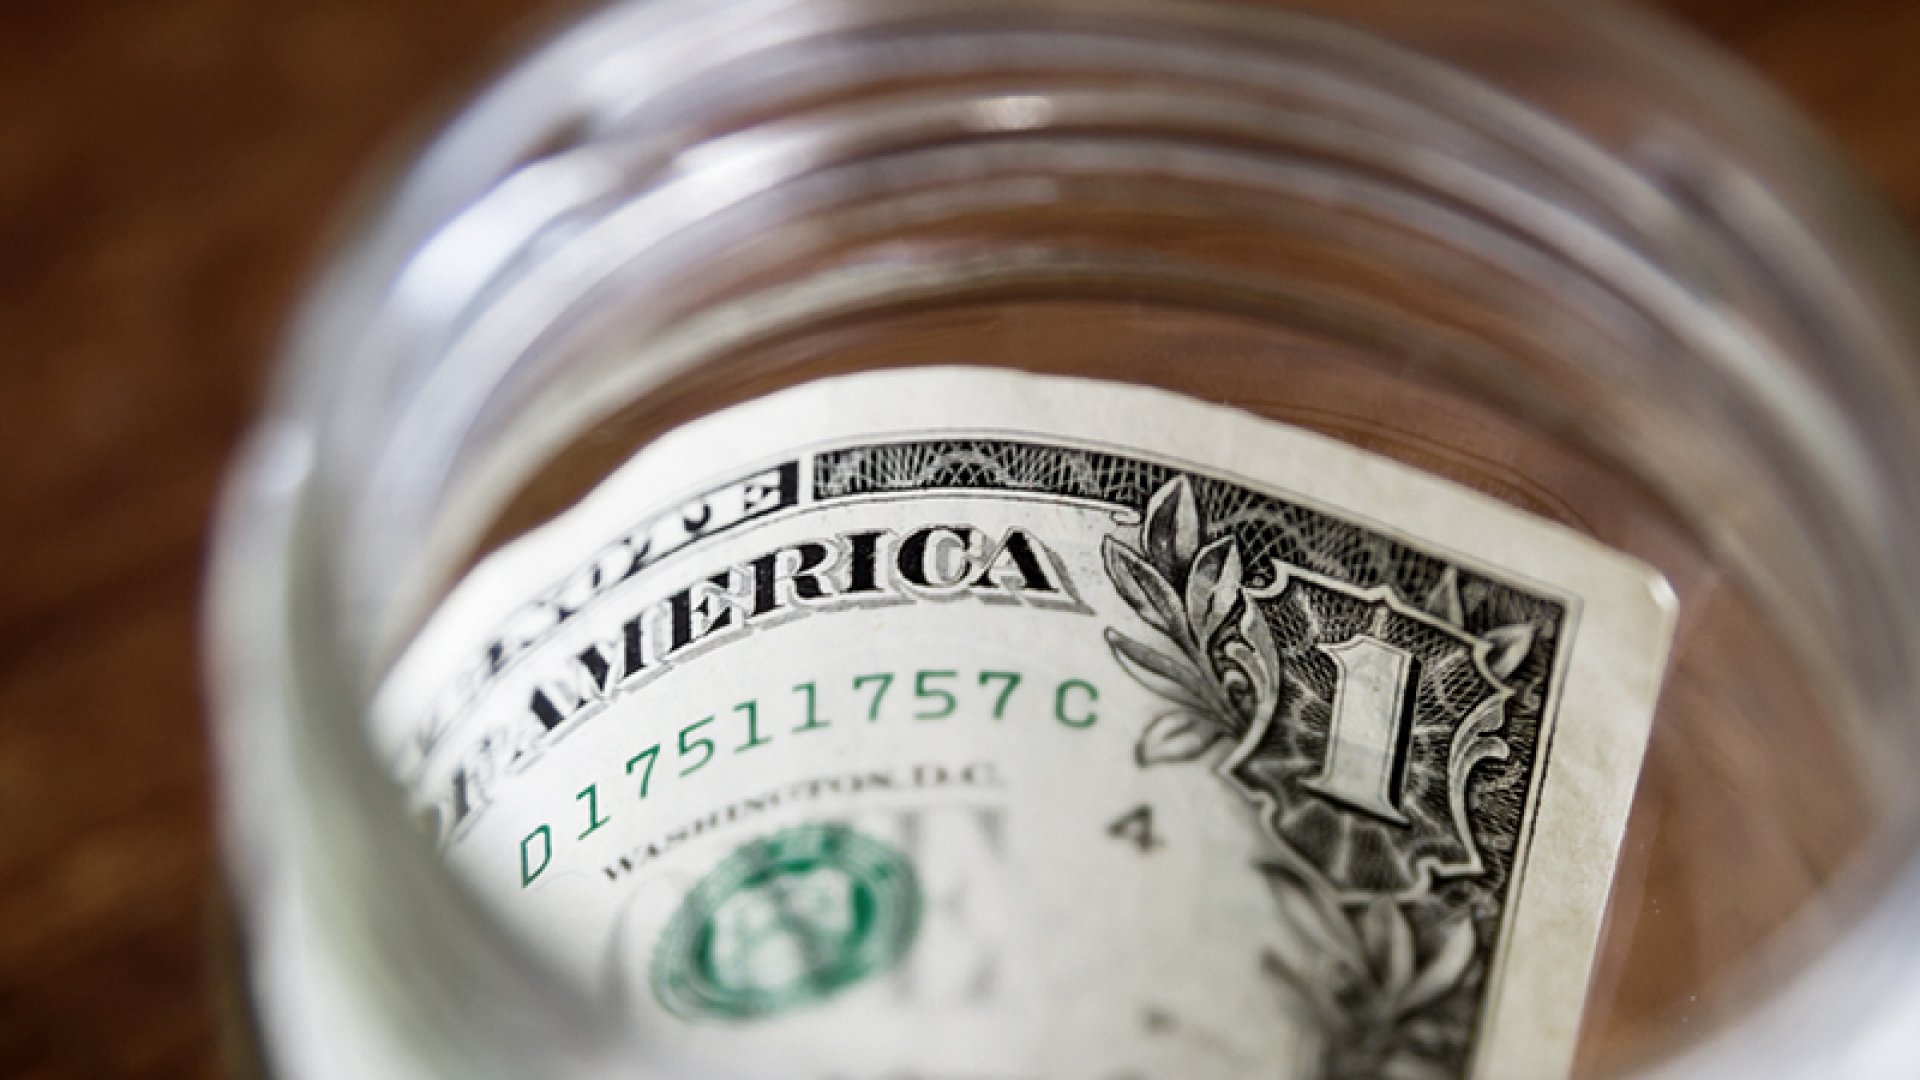 How a Typo Cost One Entrepreneur Half His Profit